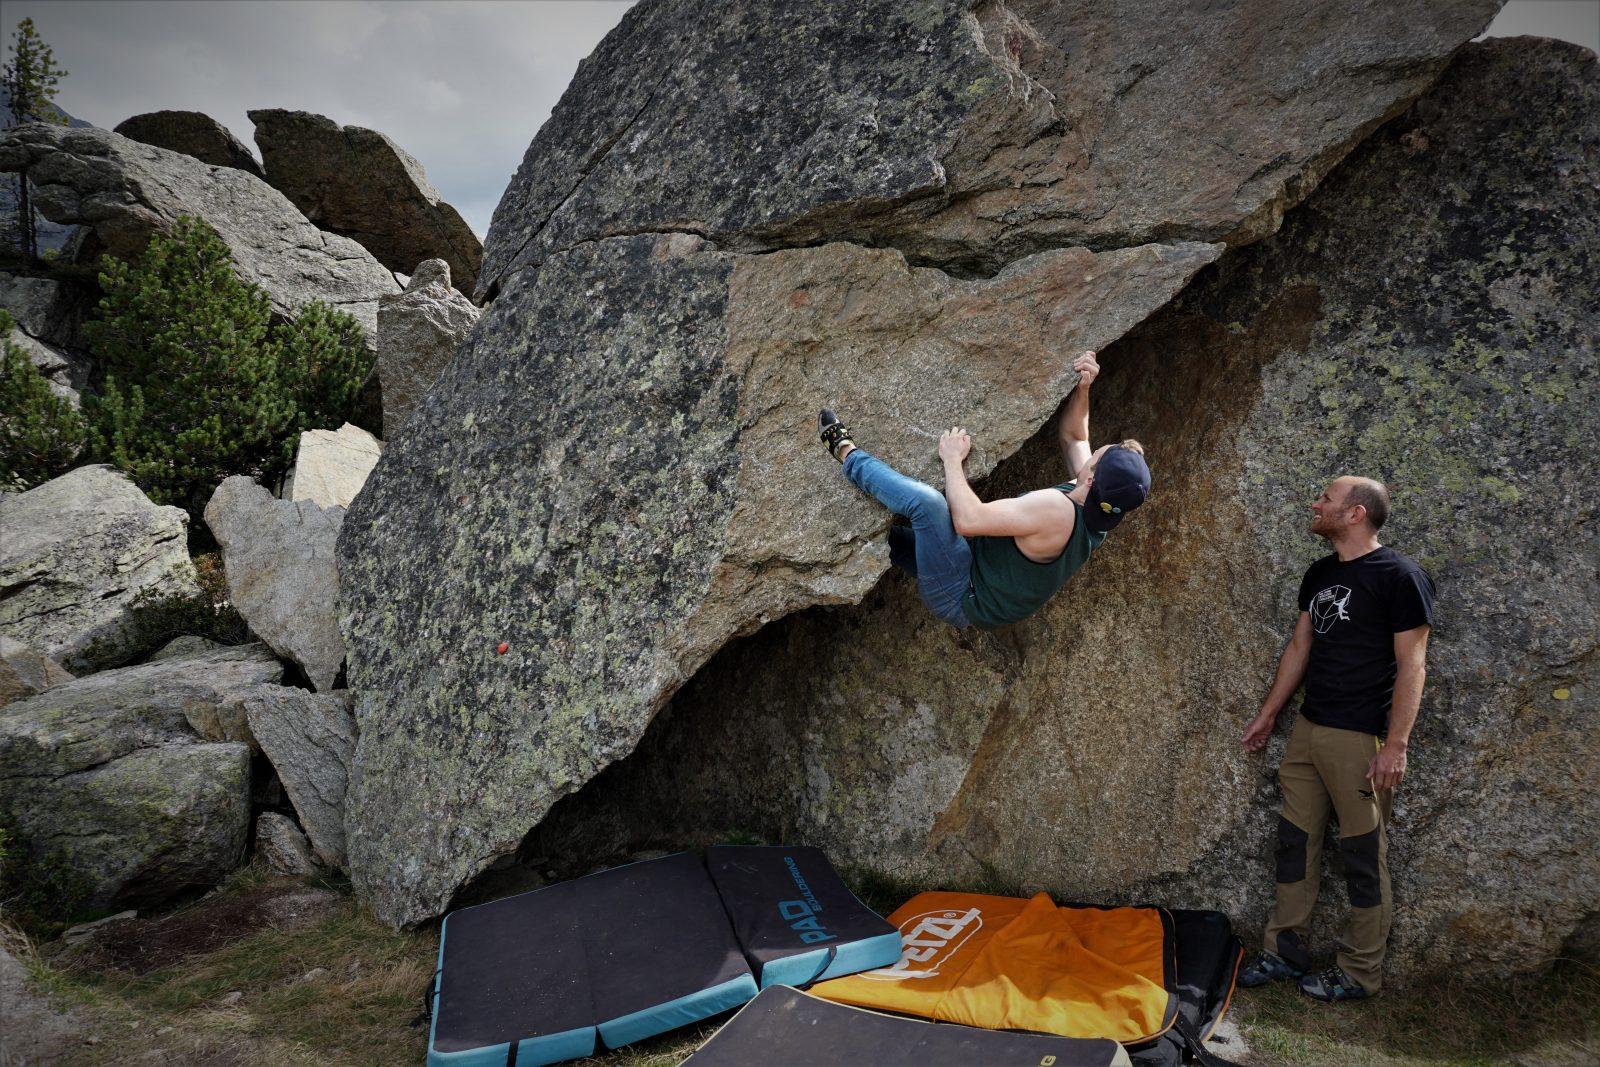 Herausfordernde Überhänge beim Bouldern im Silvapark | Climbers Paradise